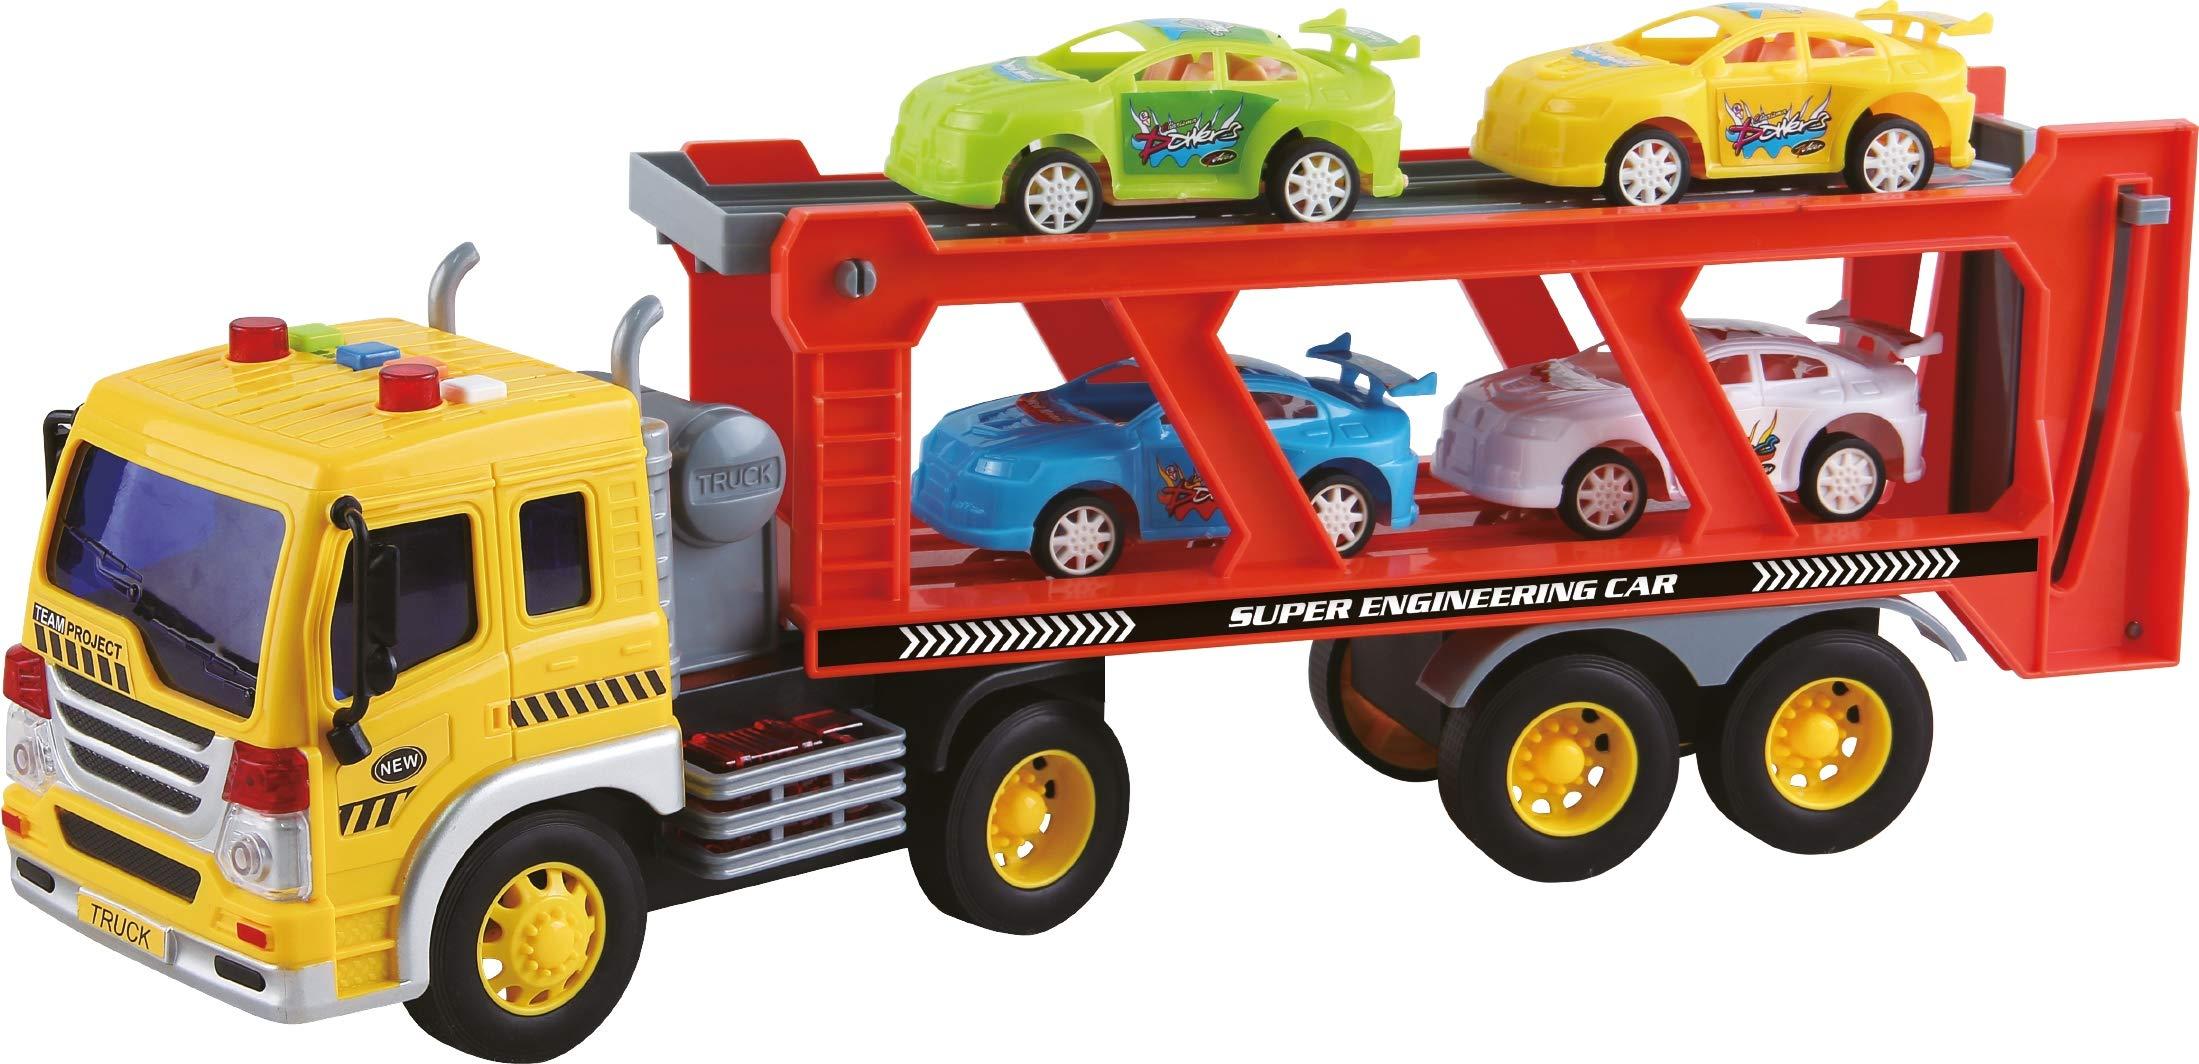 Tg720 - Friction Powered Car Transporter